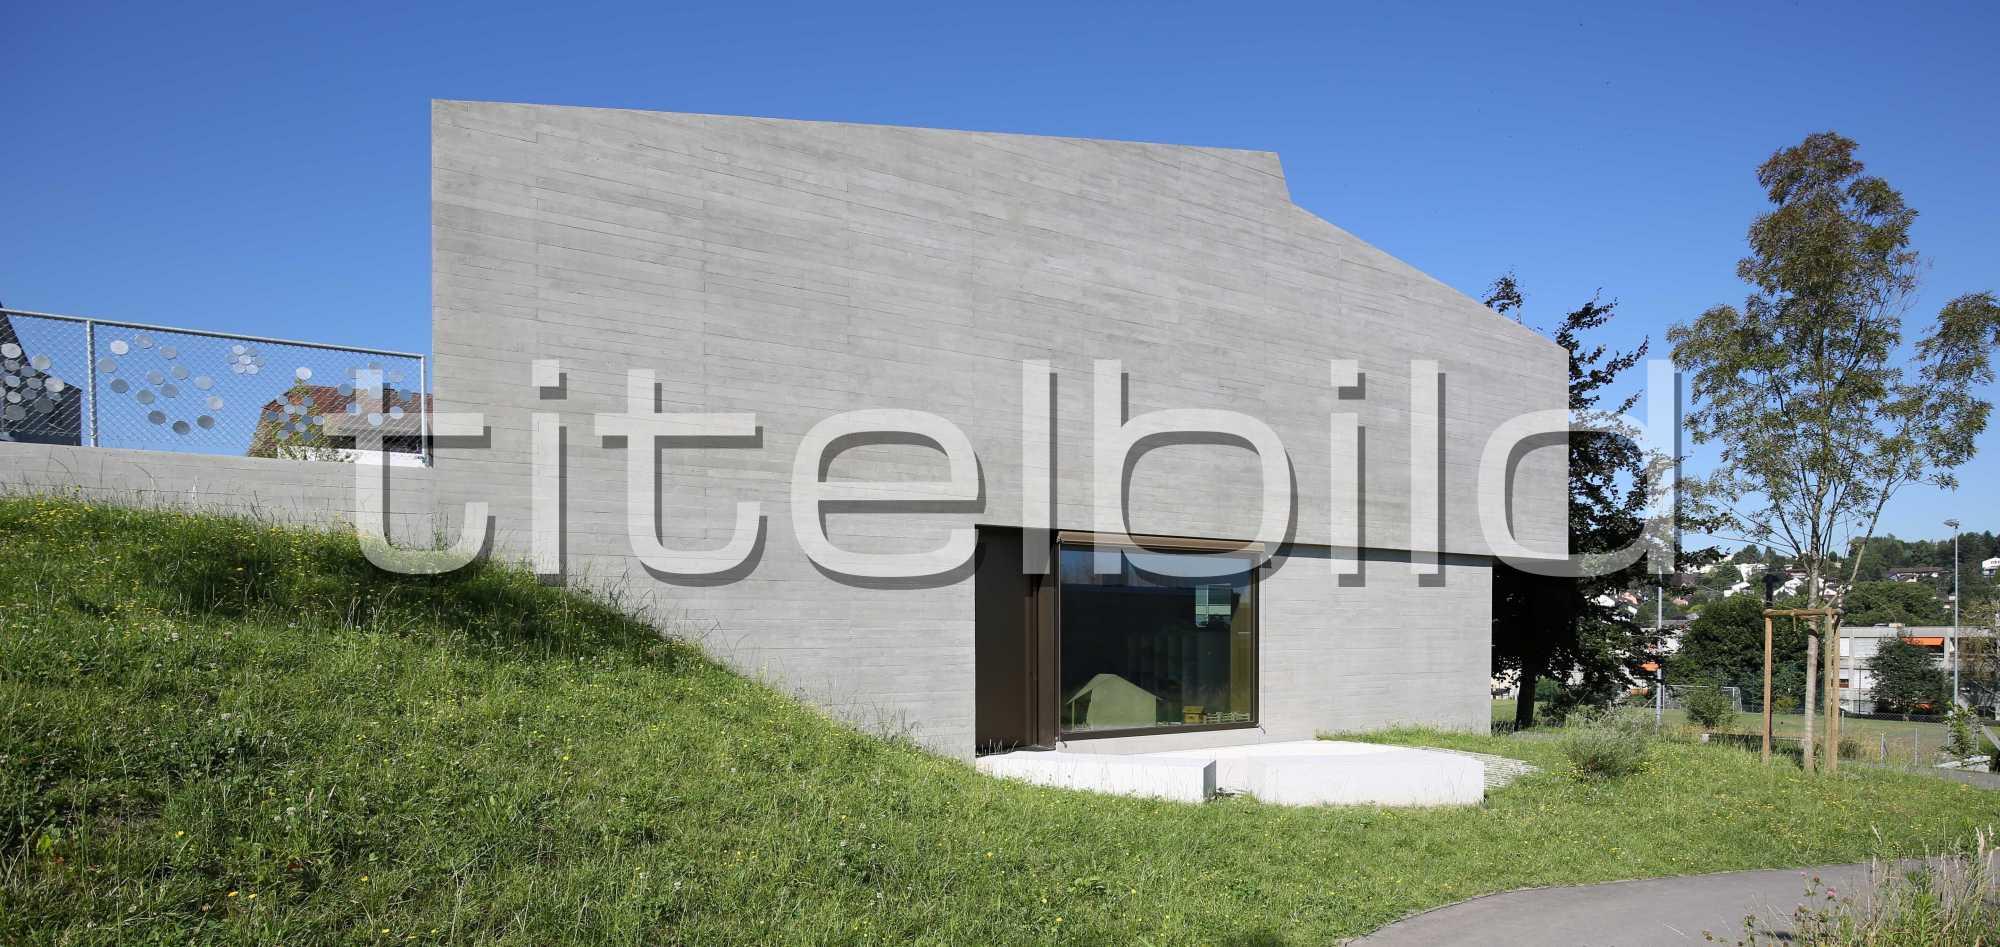 Projektbild-Nr. 4: Schulanlage Talholz